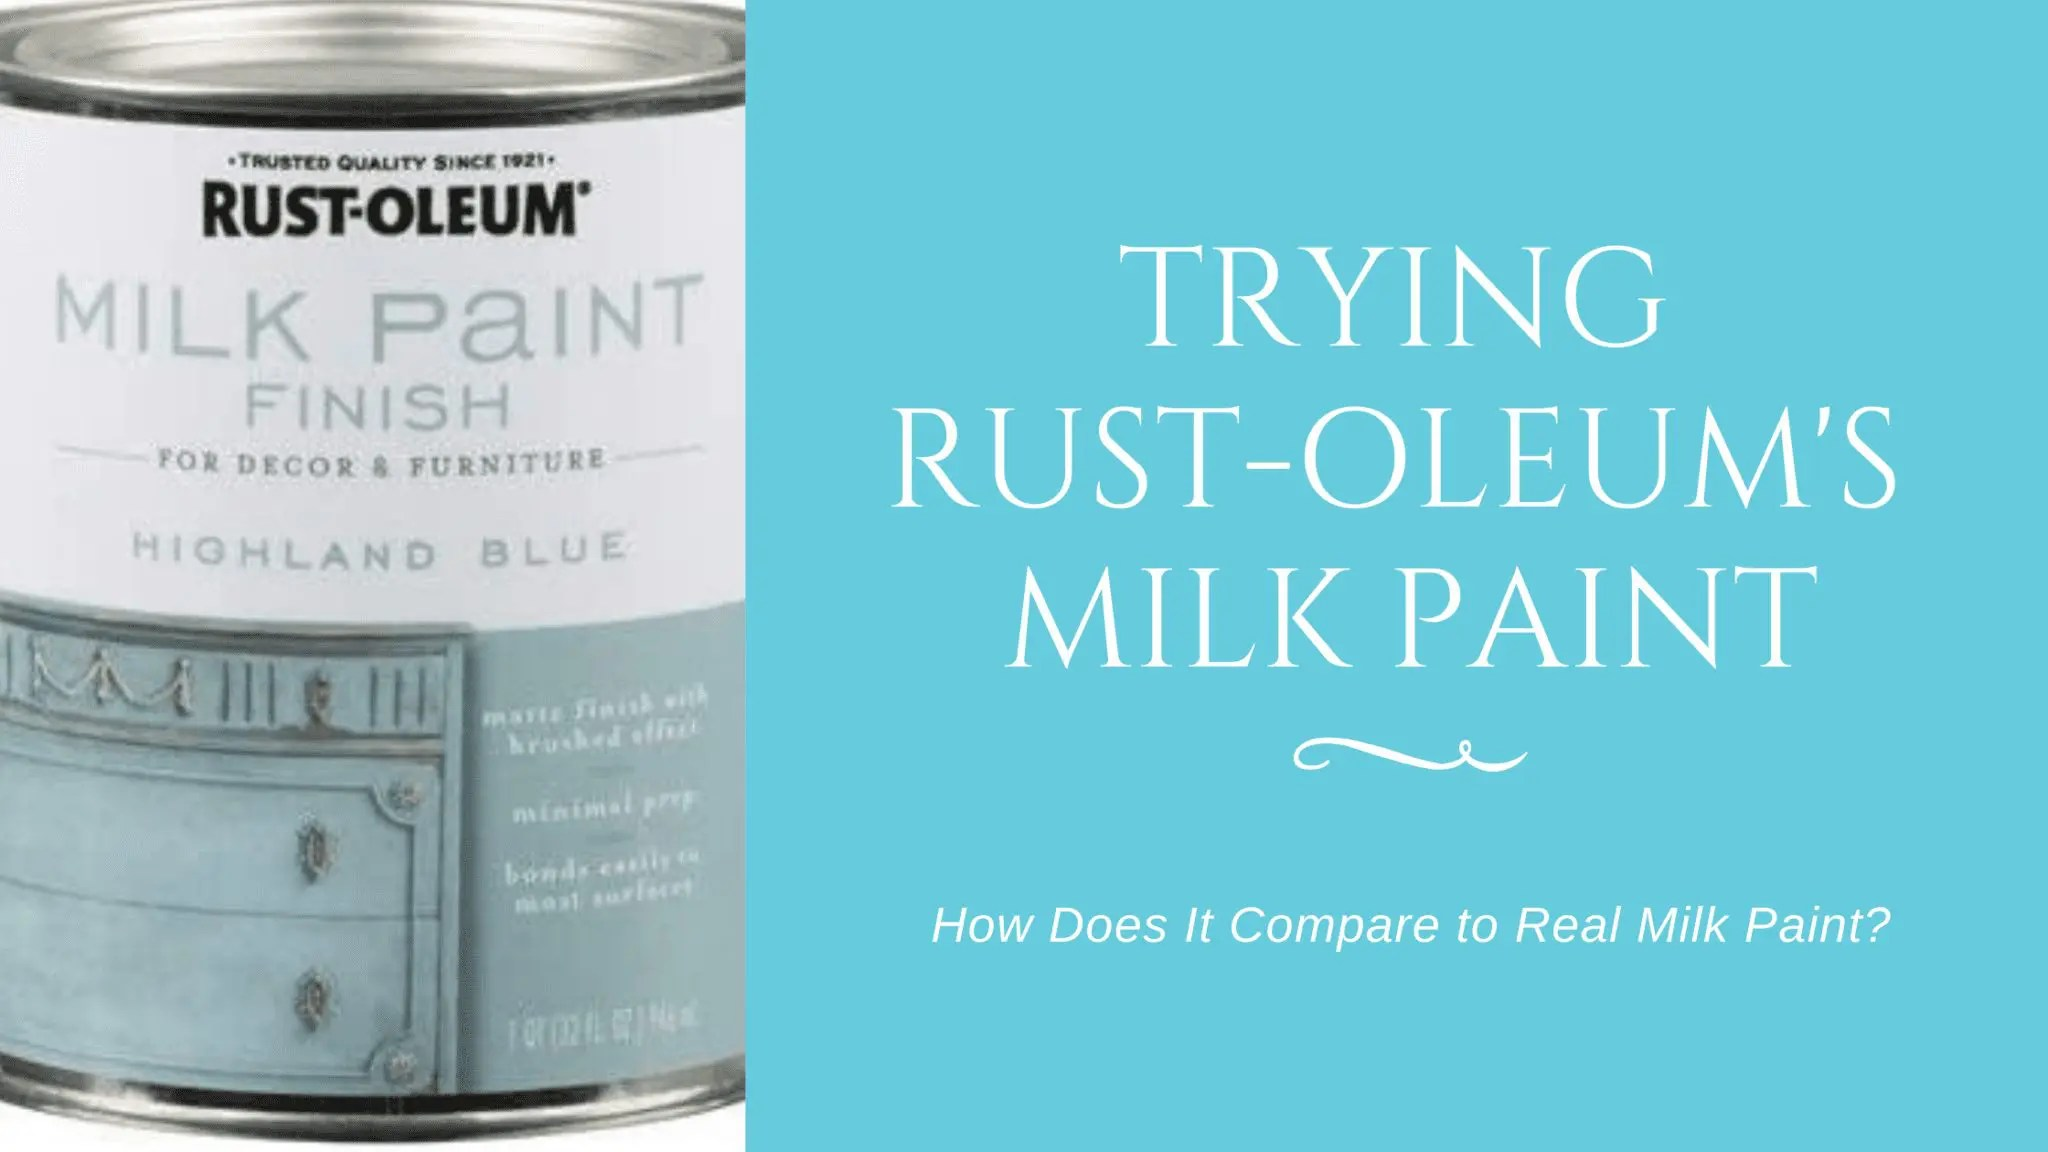 Trying Rust-Oleum's Milk Paint Finish